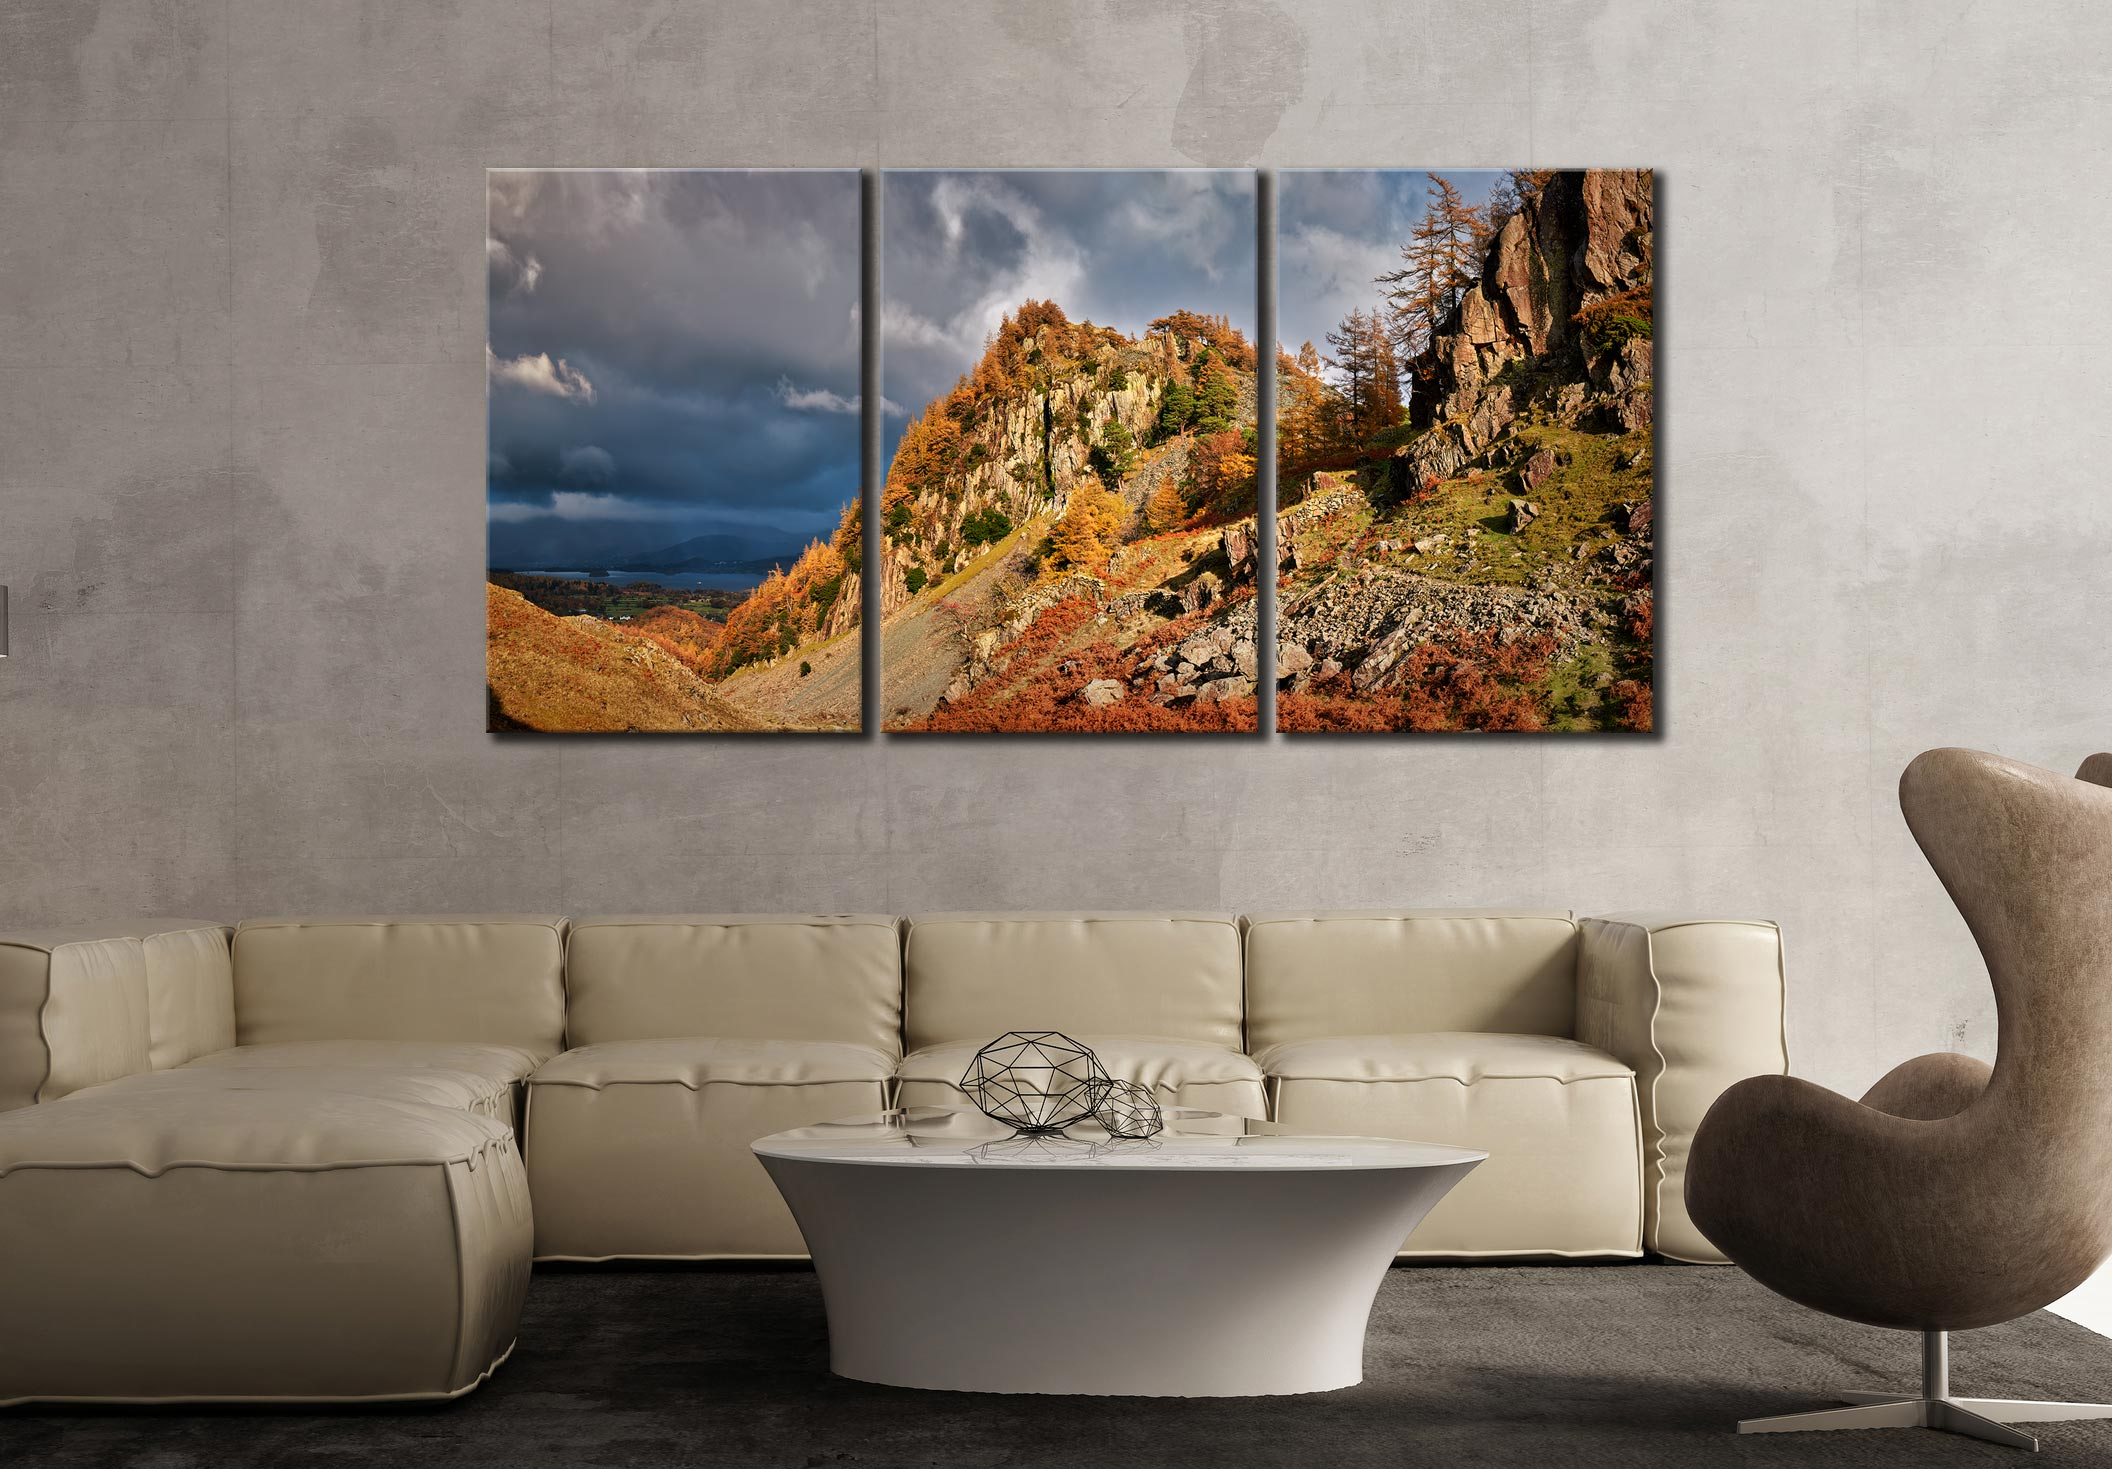 Castle Crag Autumn Sunshine - 3 Panel Canvas on Wall